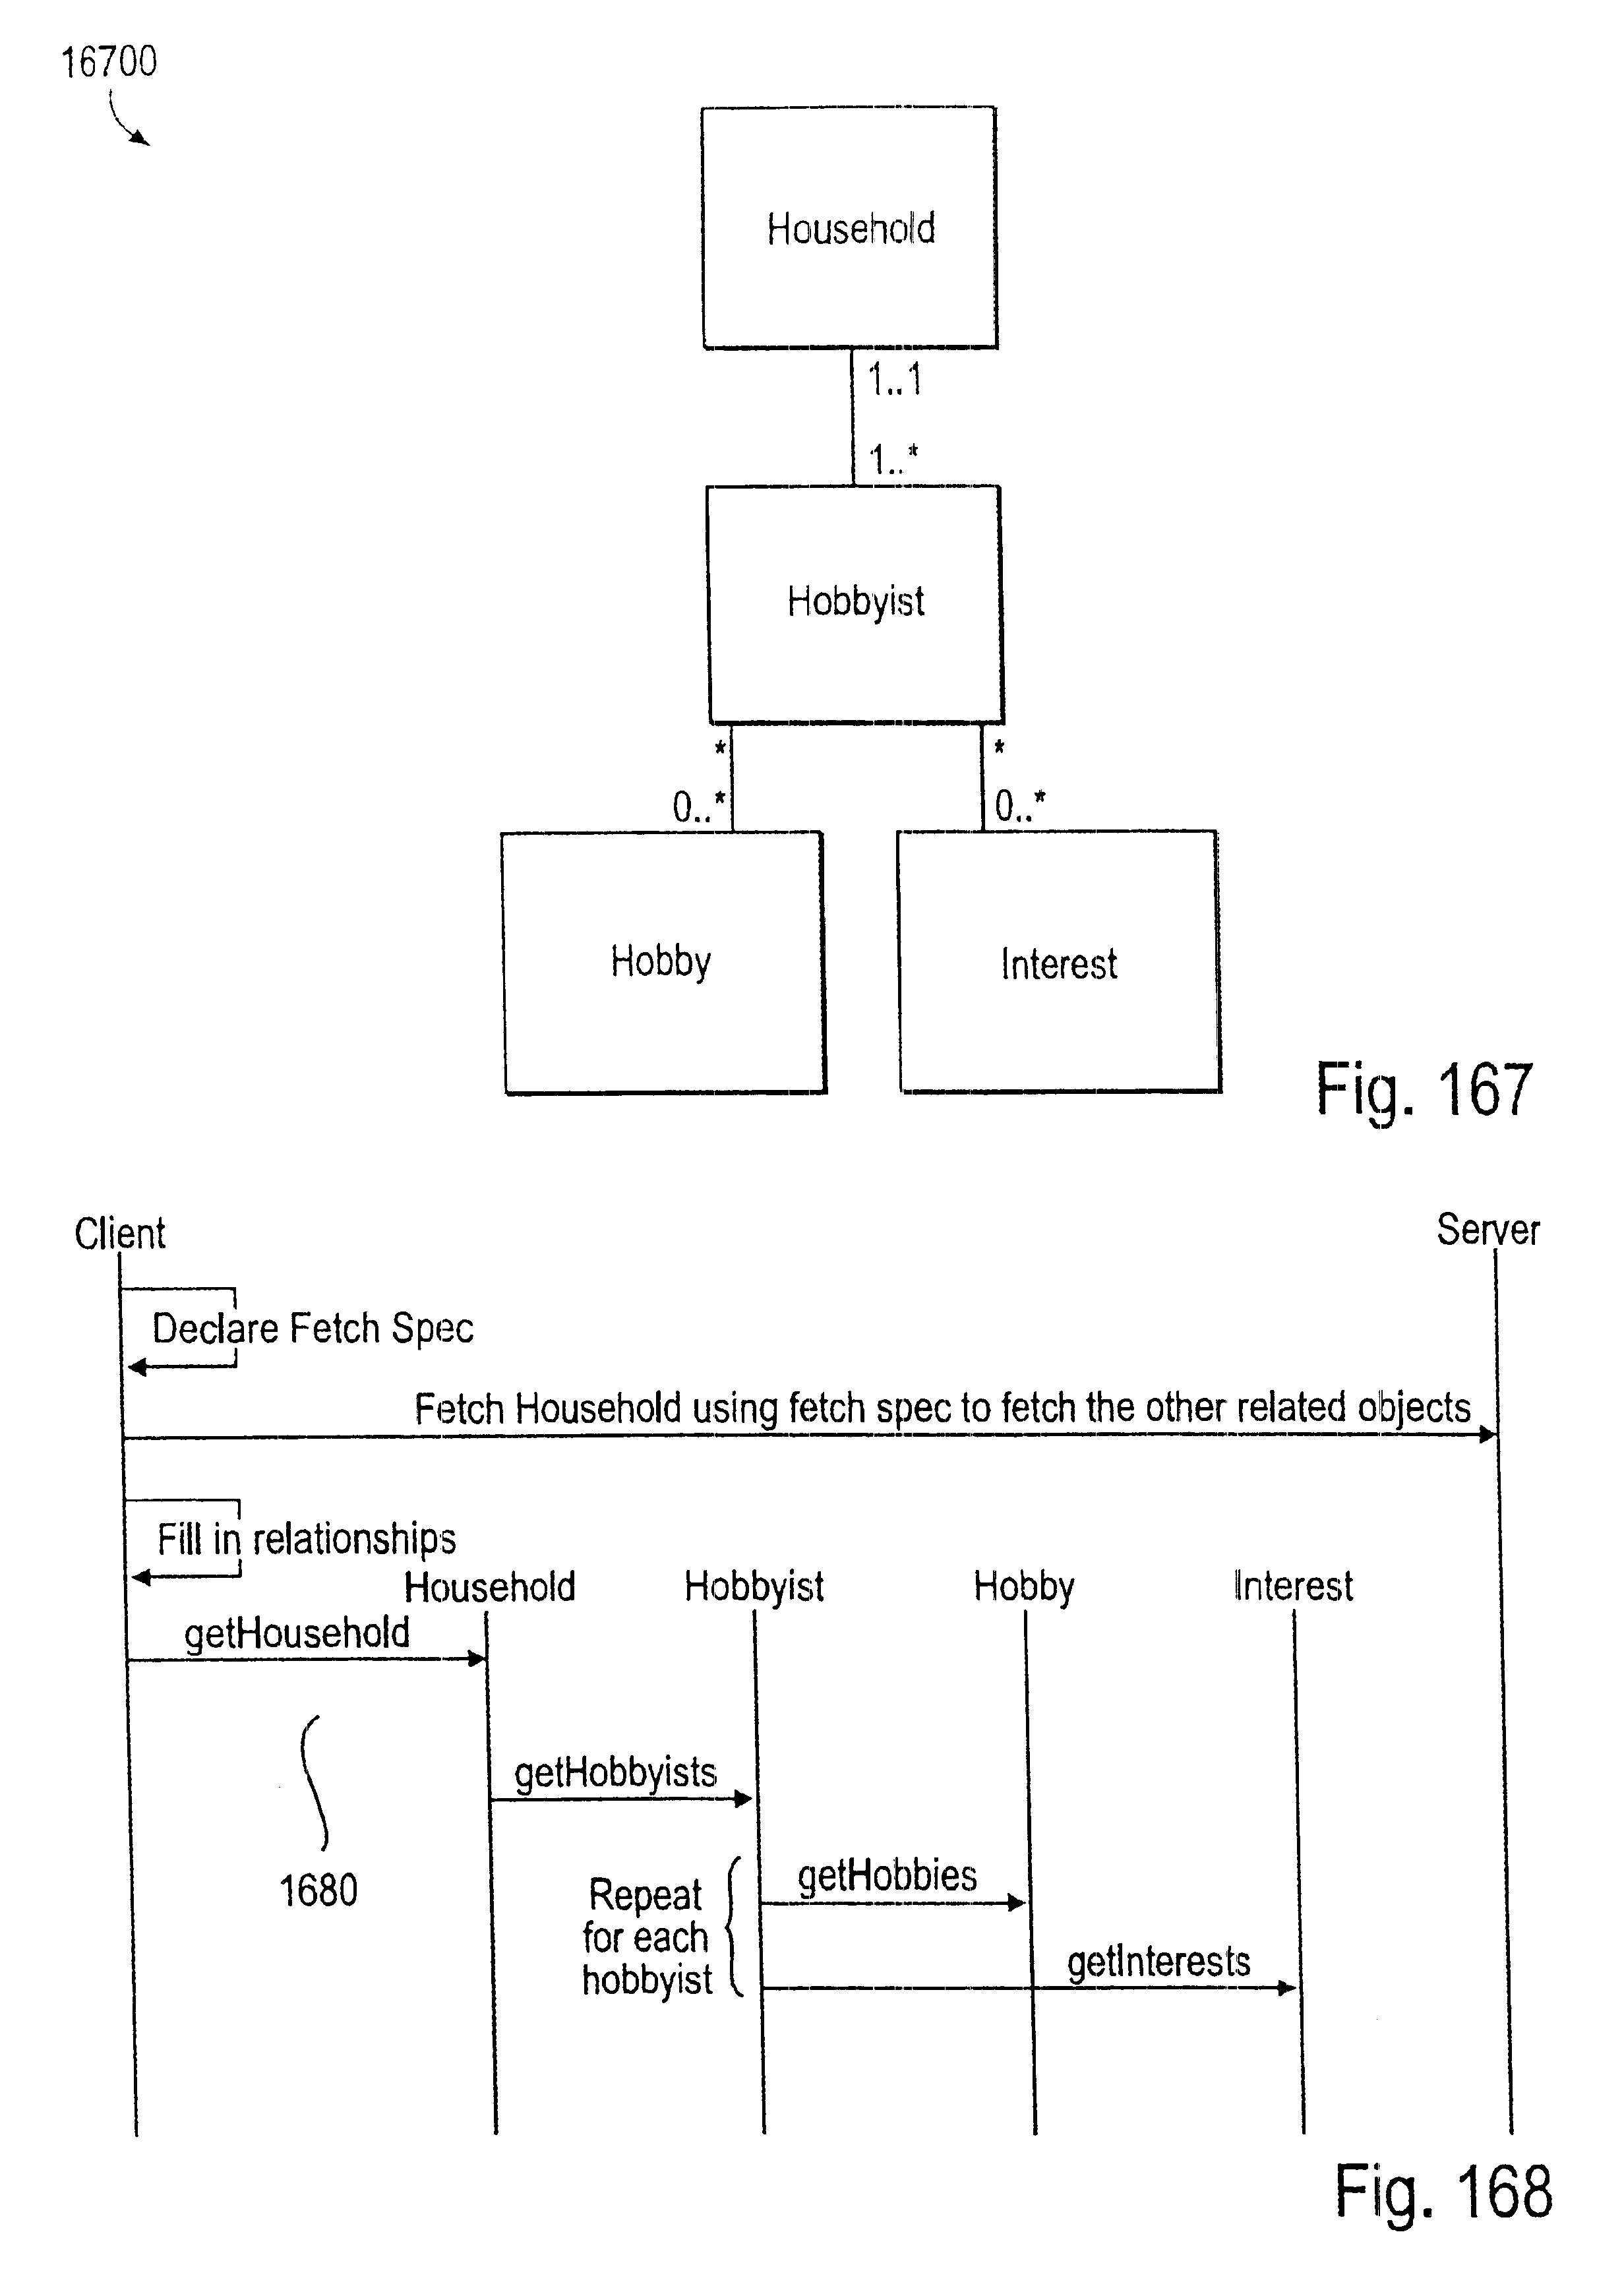 Patent US 6,550,057 B1